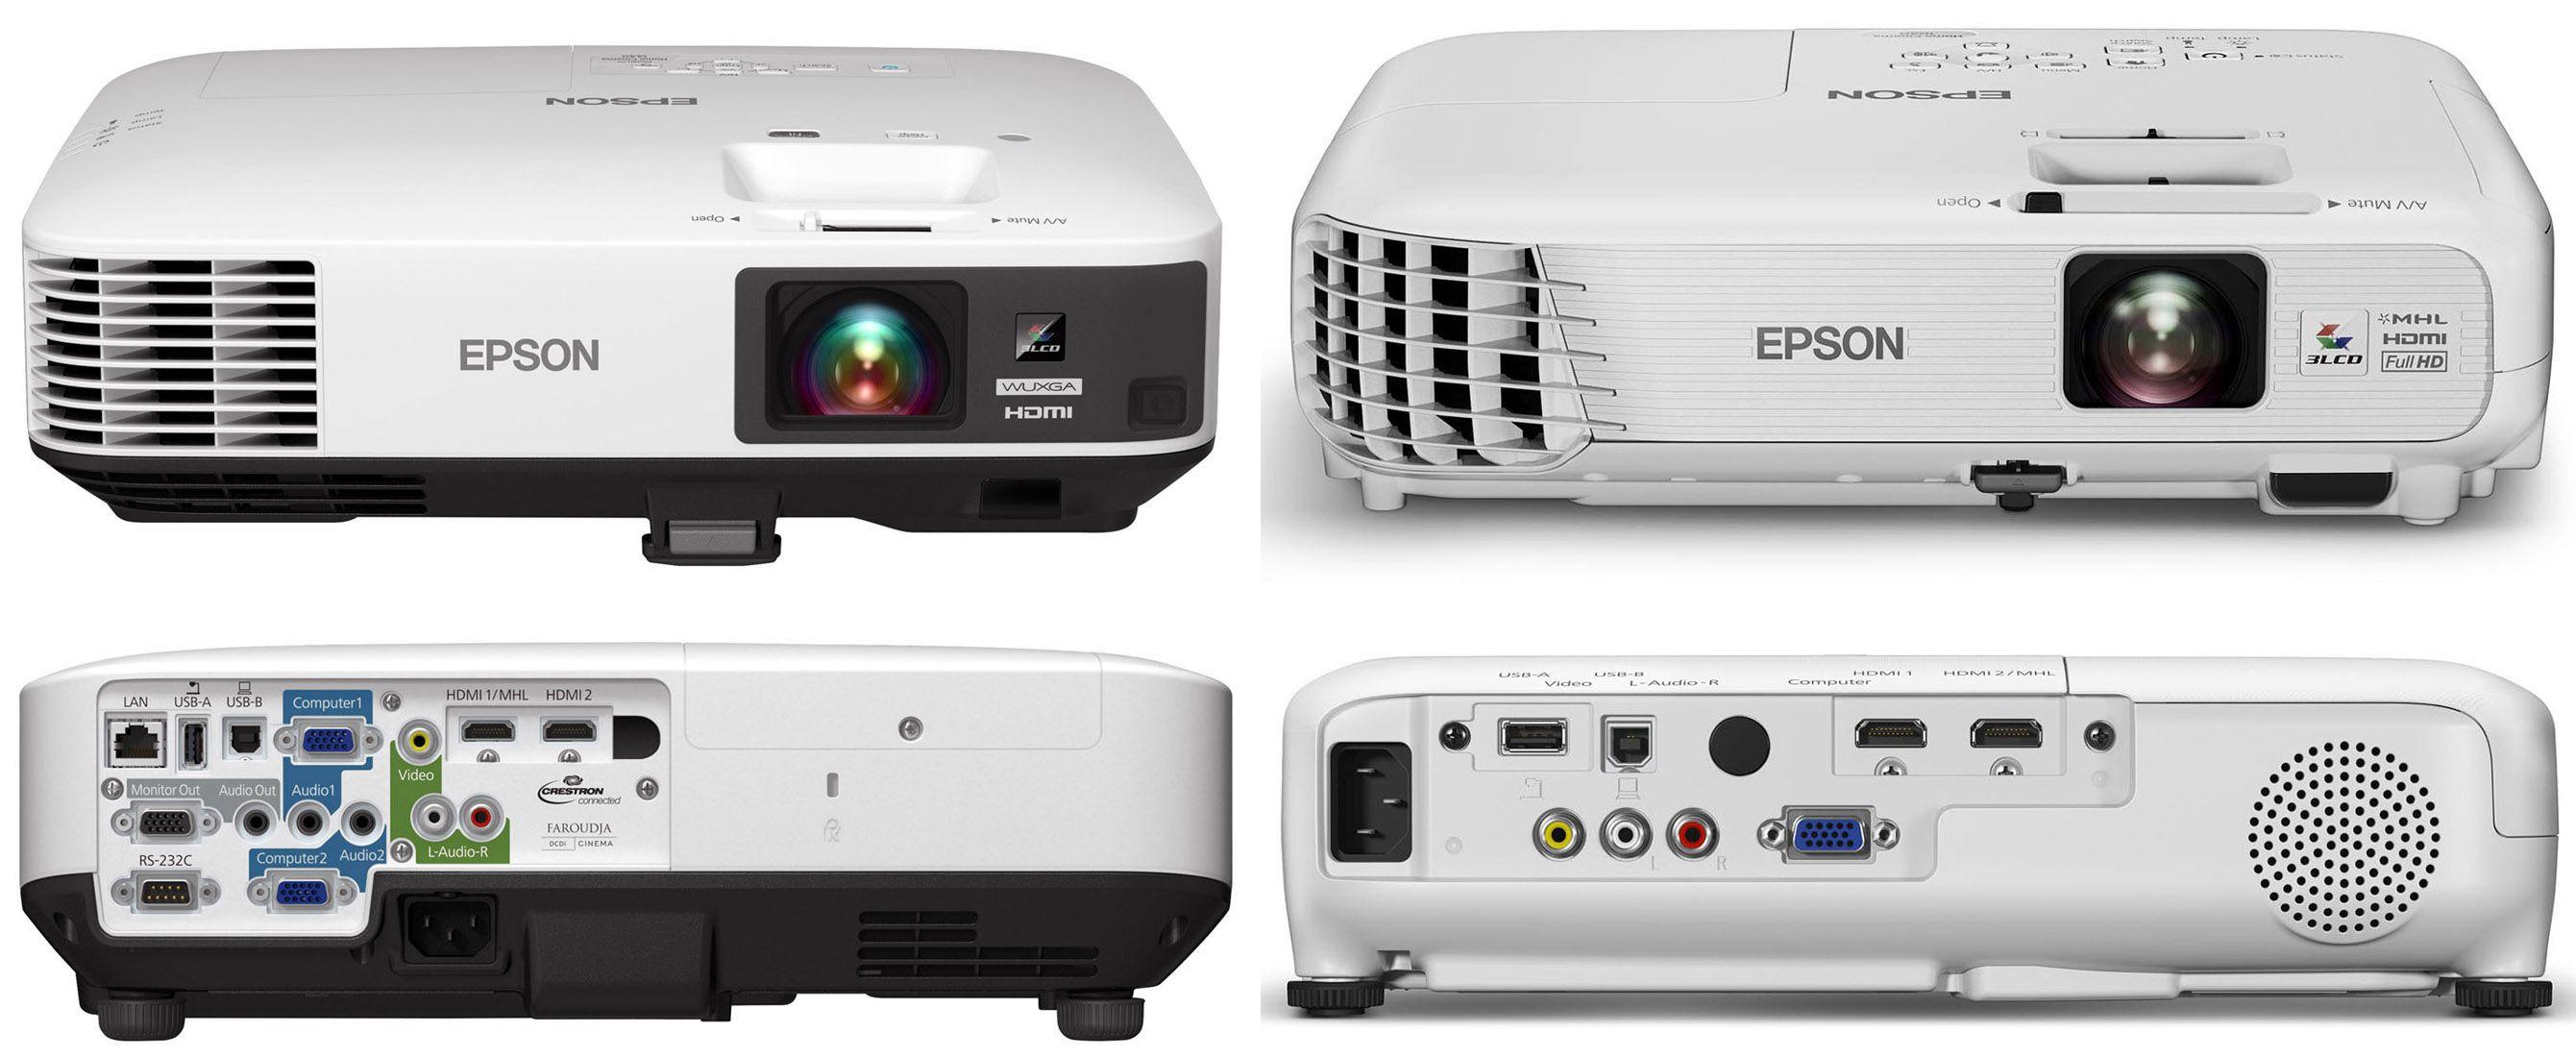 epson powerlite home cinema 710hd 3lcd projector